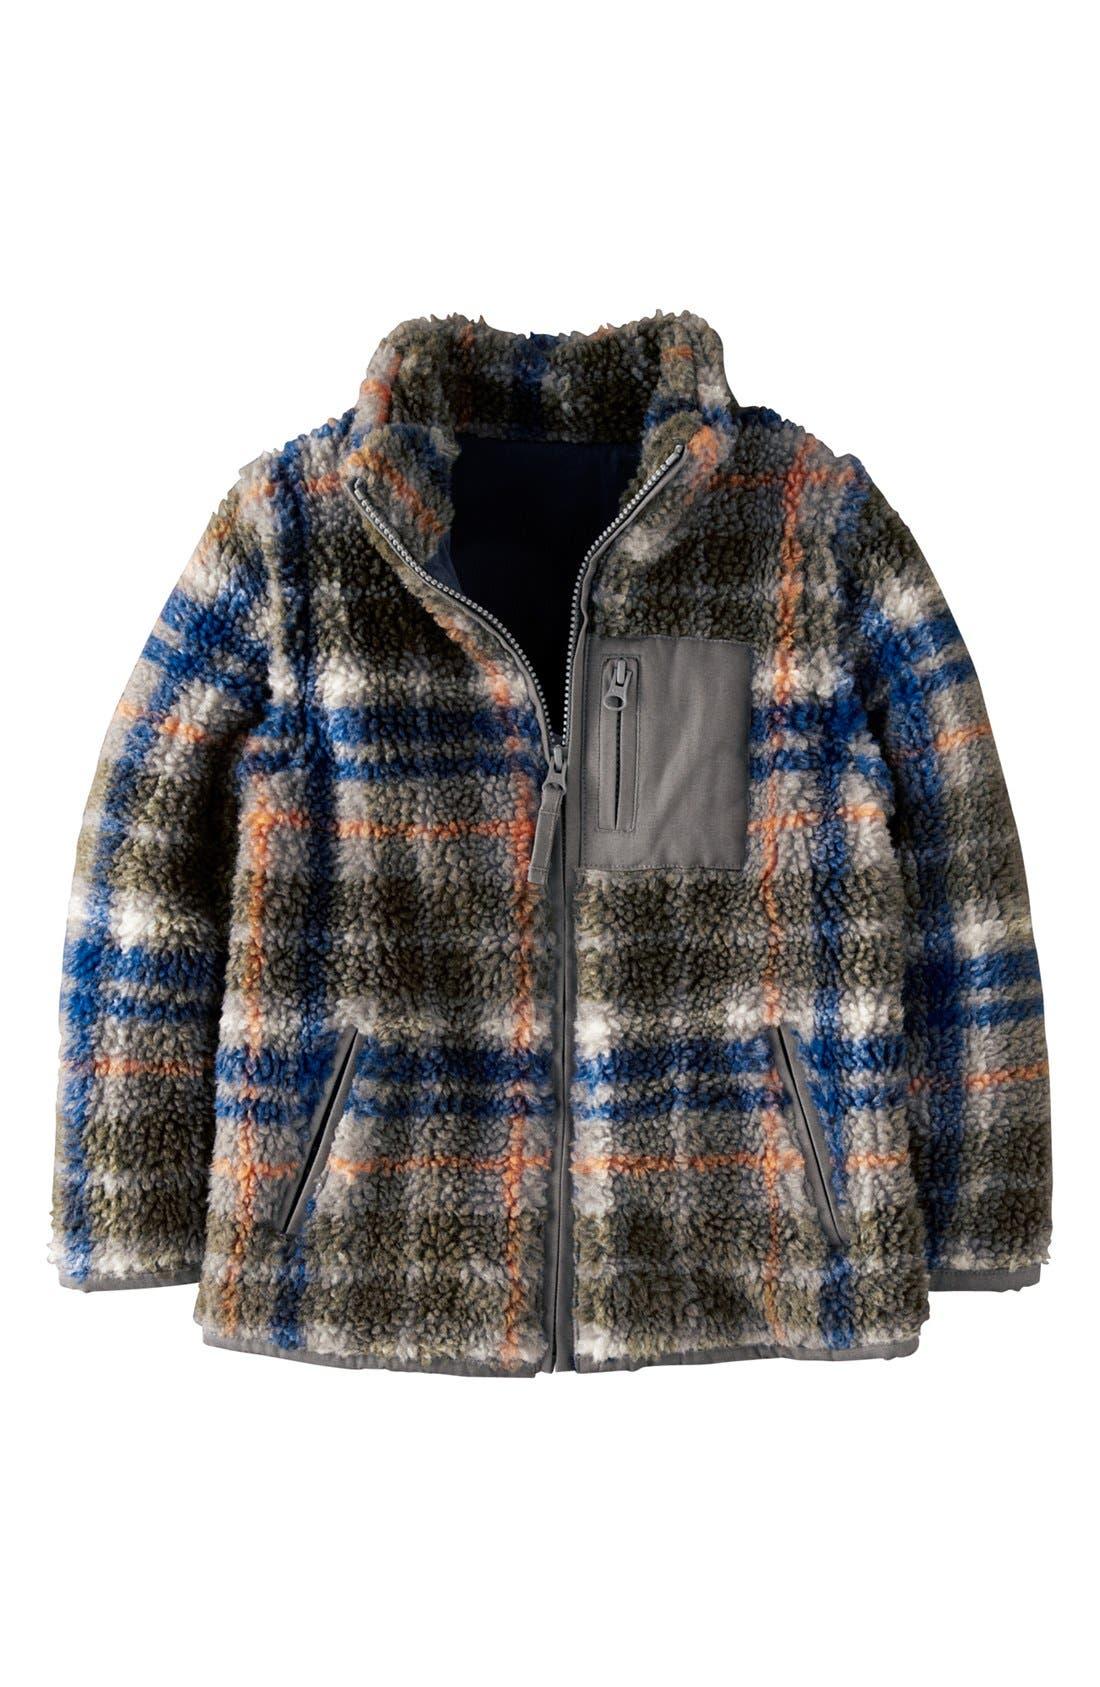 Alternate Image 1 Selected - Mini Boden Convertible Jacket (Toddler Boys, Little Boys & Big Boys)